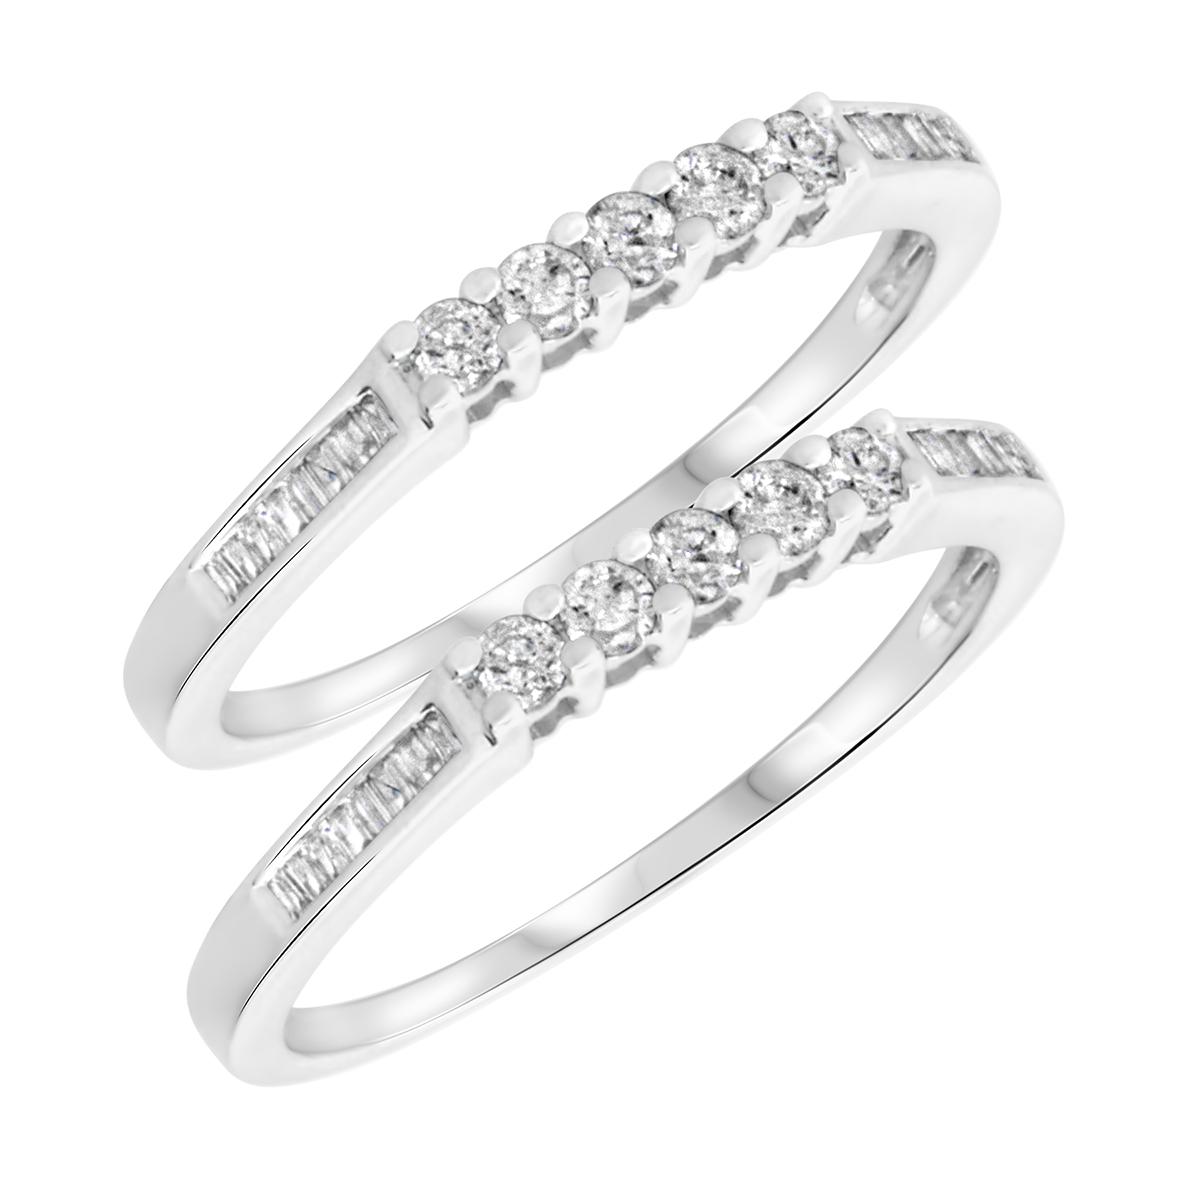 1/2 Carat T.W. Rounds Cut Ladies Same Sex Wedding Band Set 10K White Gold- Size